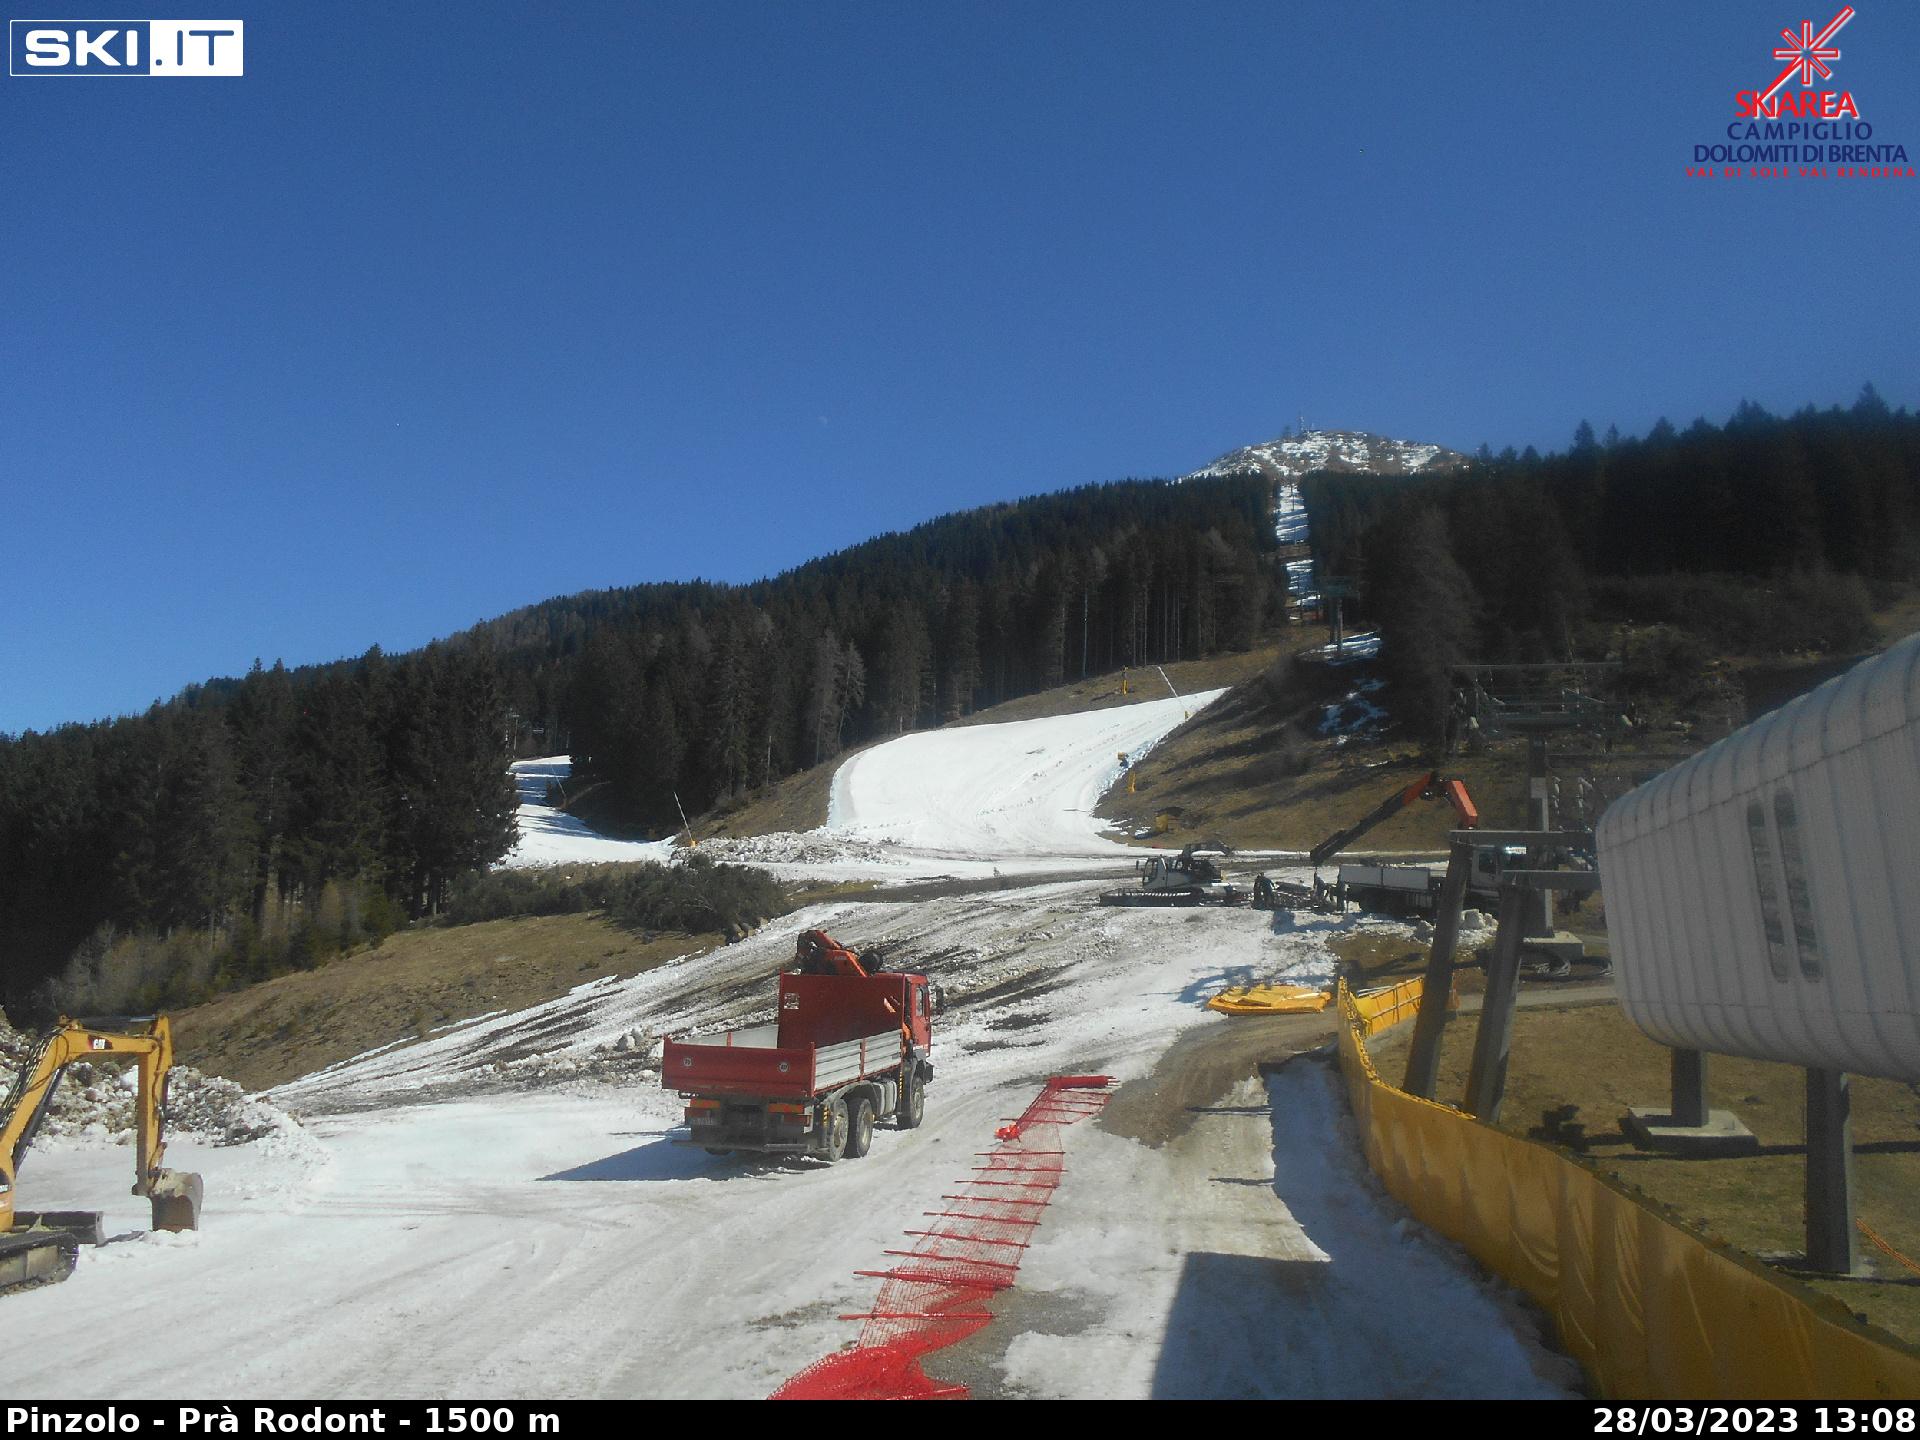 Webcam Campiglio Doss del Sabion